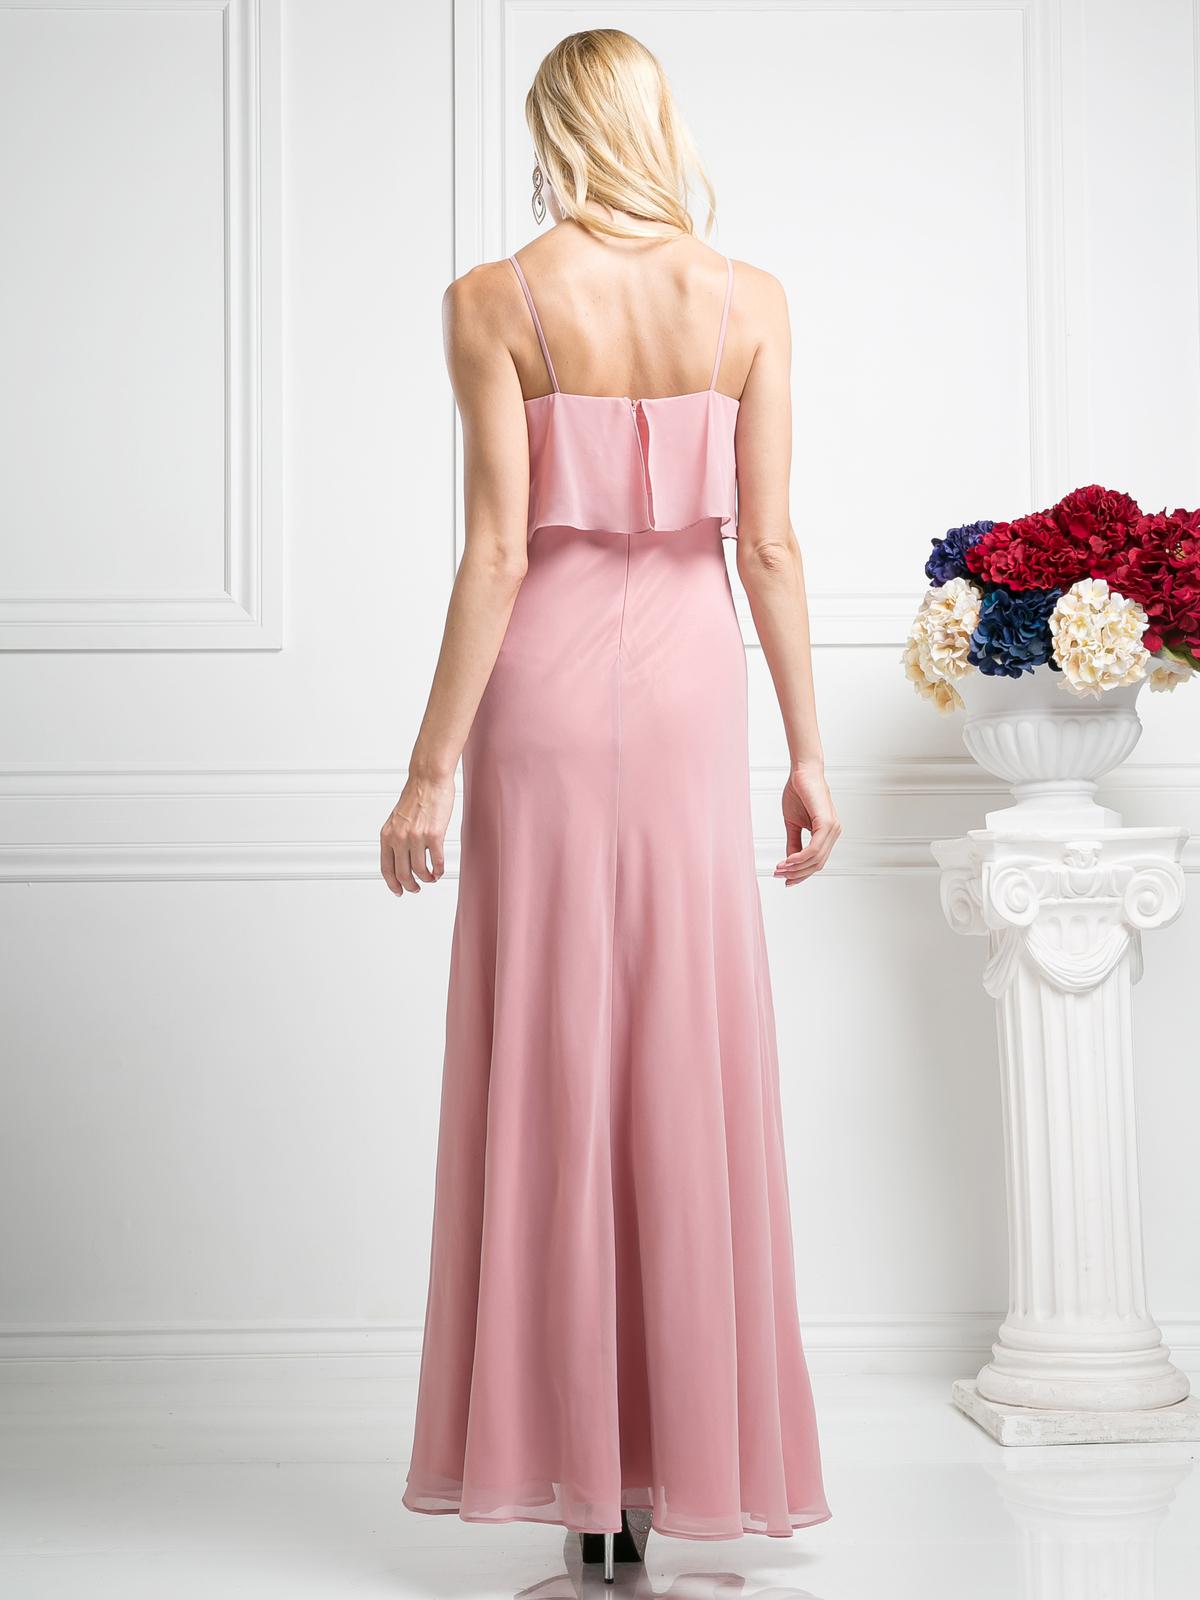 Double Layer Bodice Bridesmaid Dress